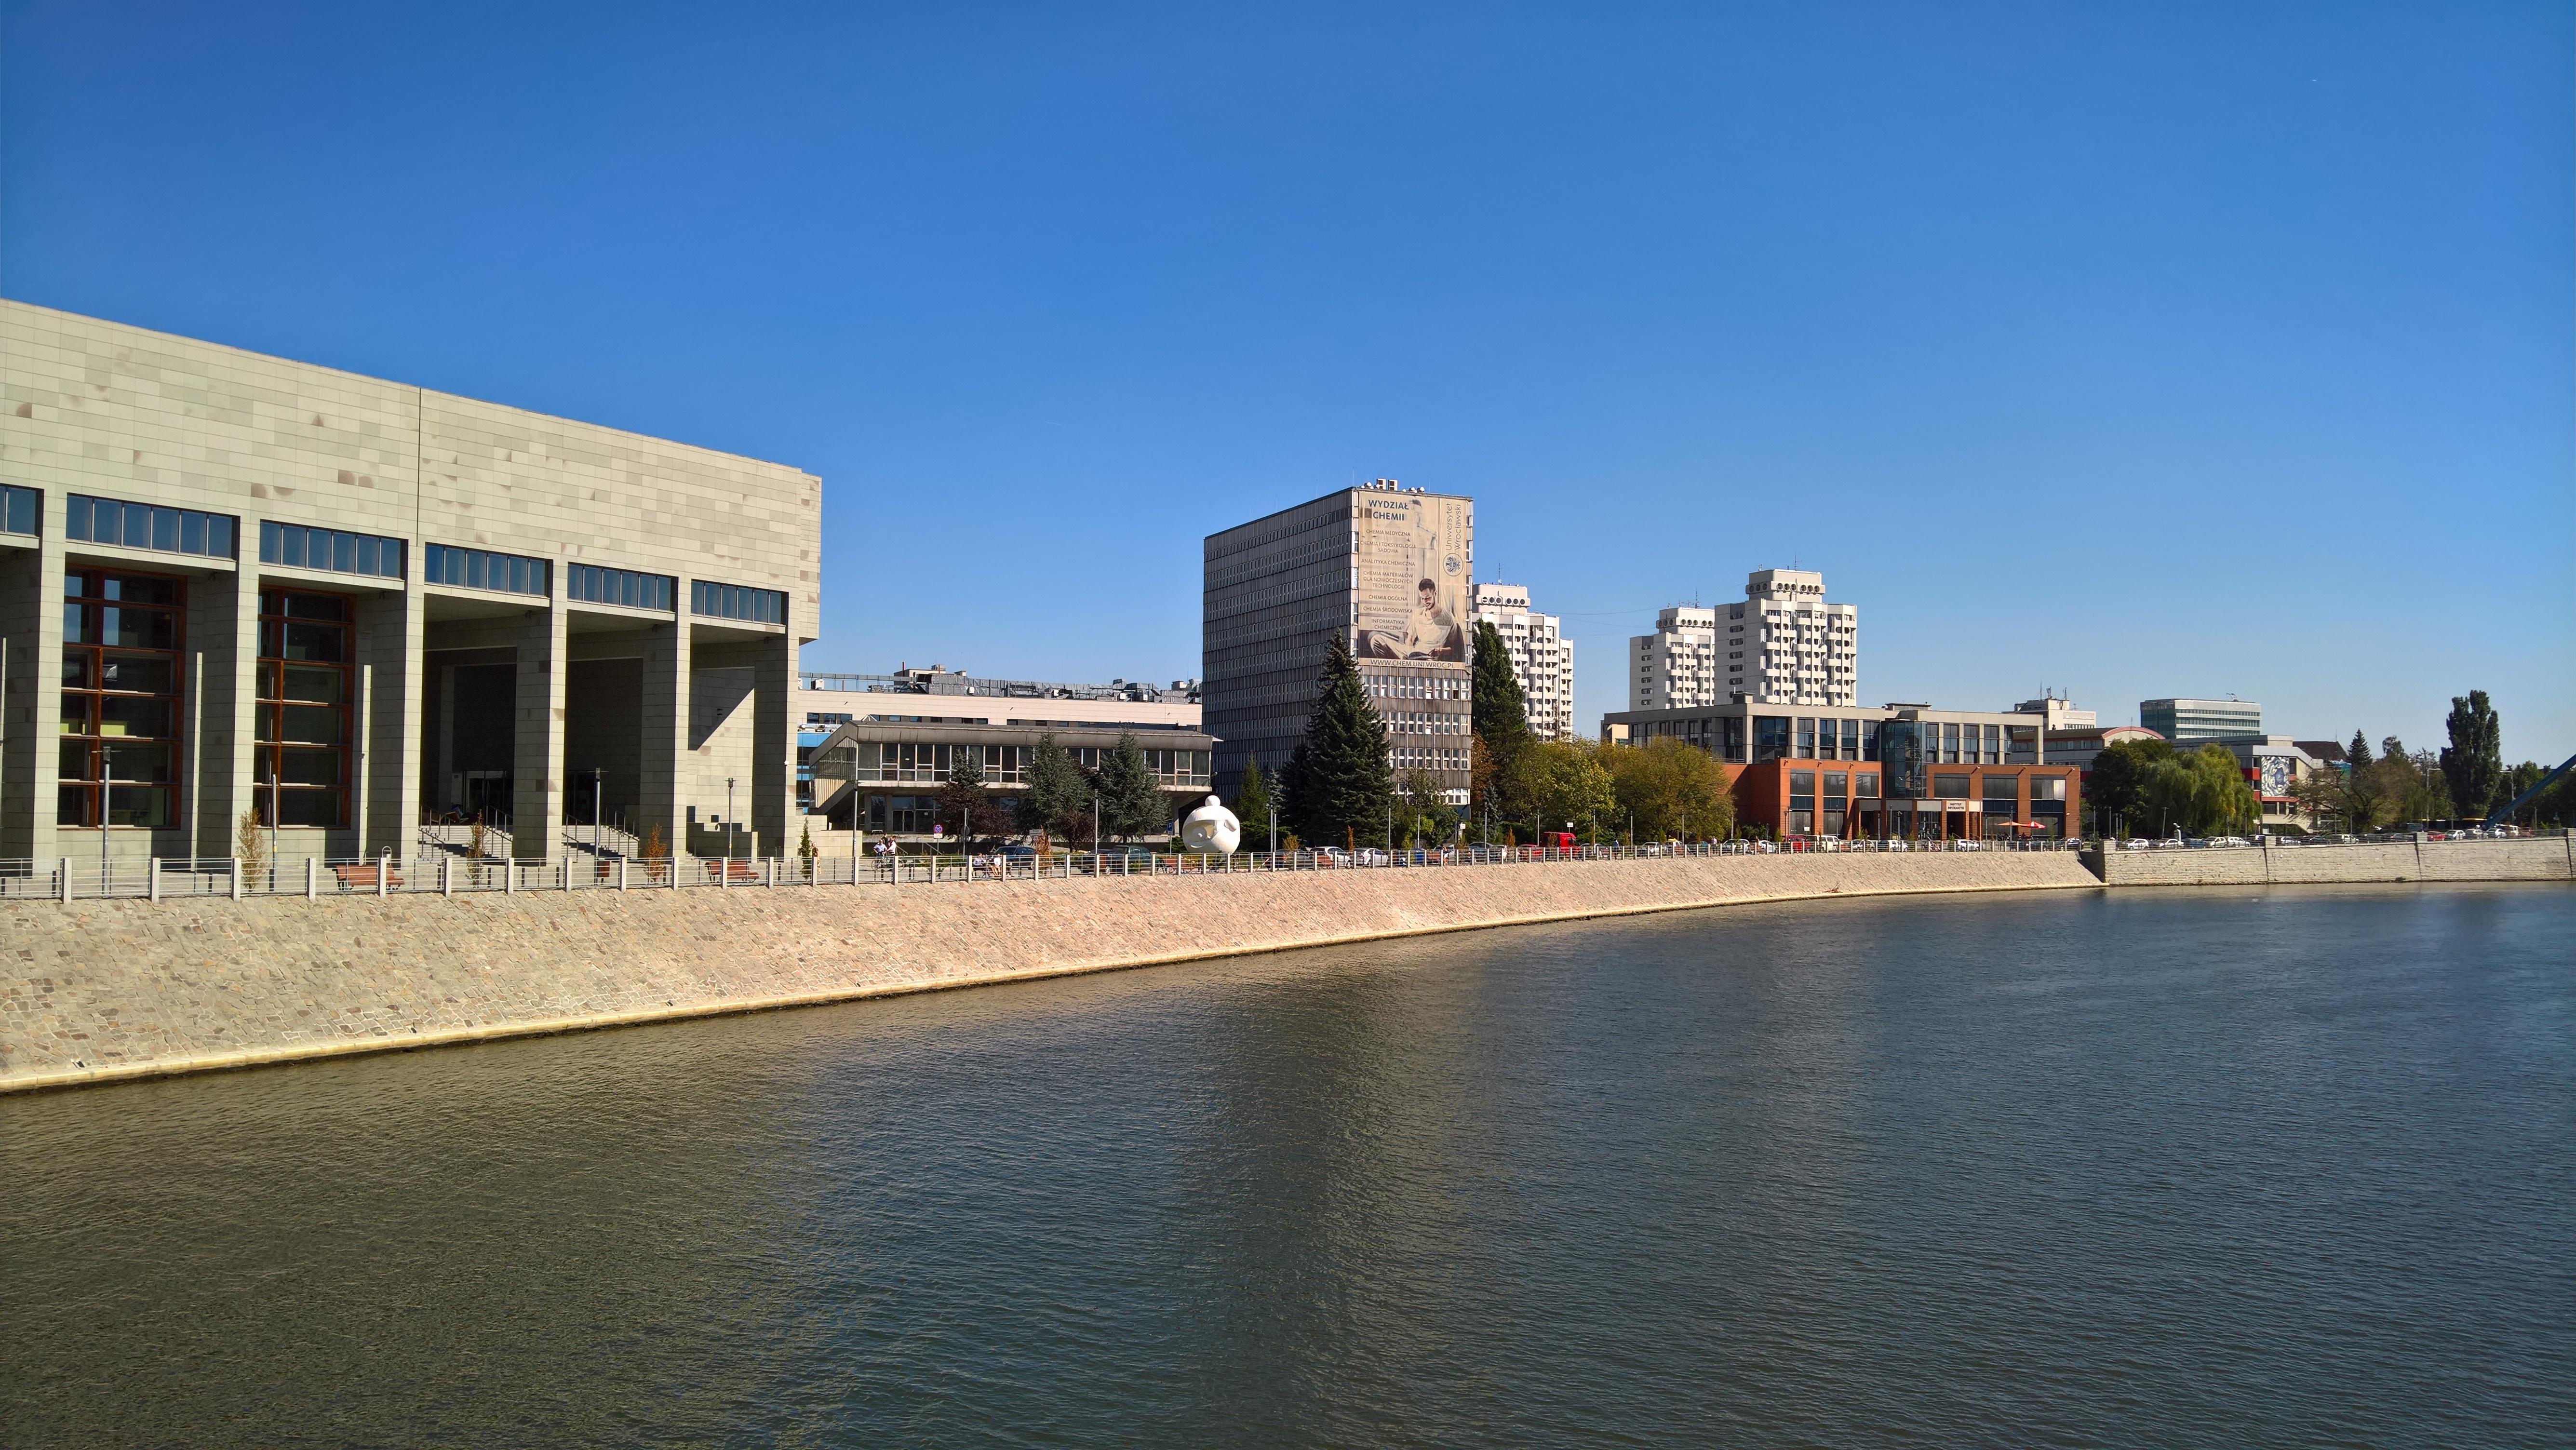 The beautiful Grunwaldzki Campus of the University of Wrocław